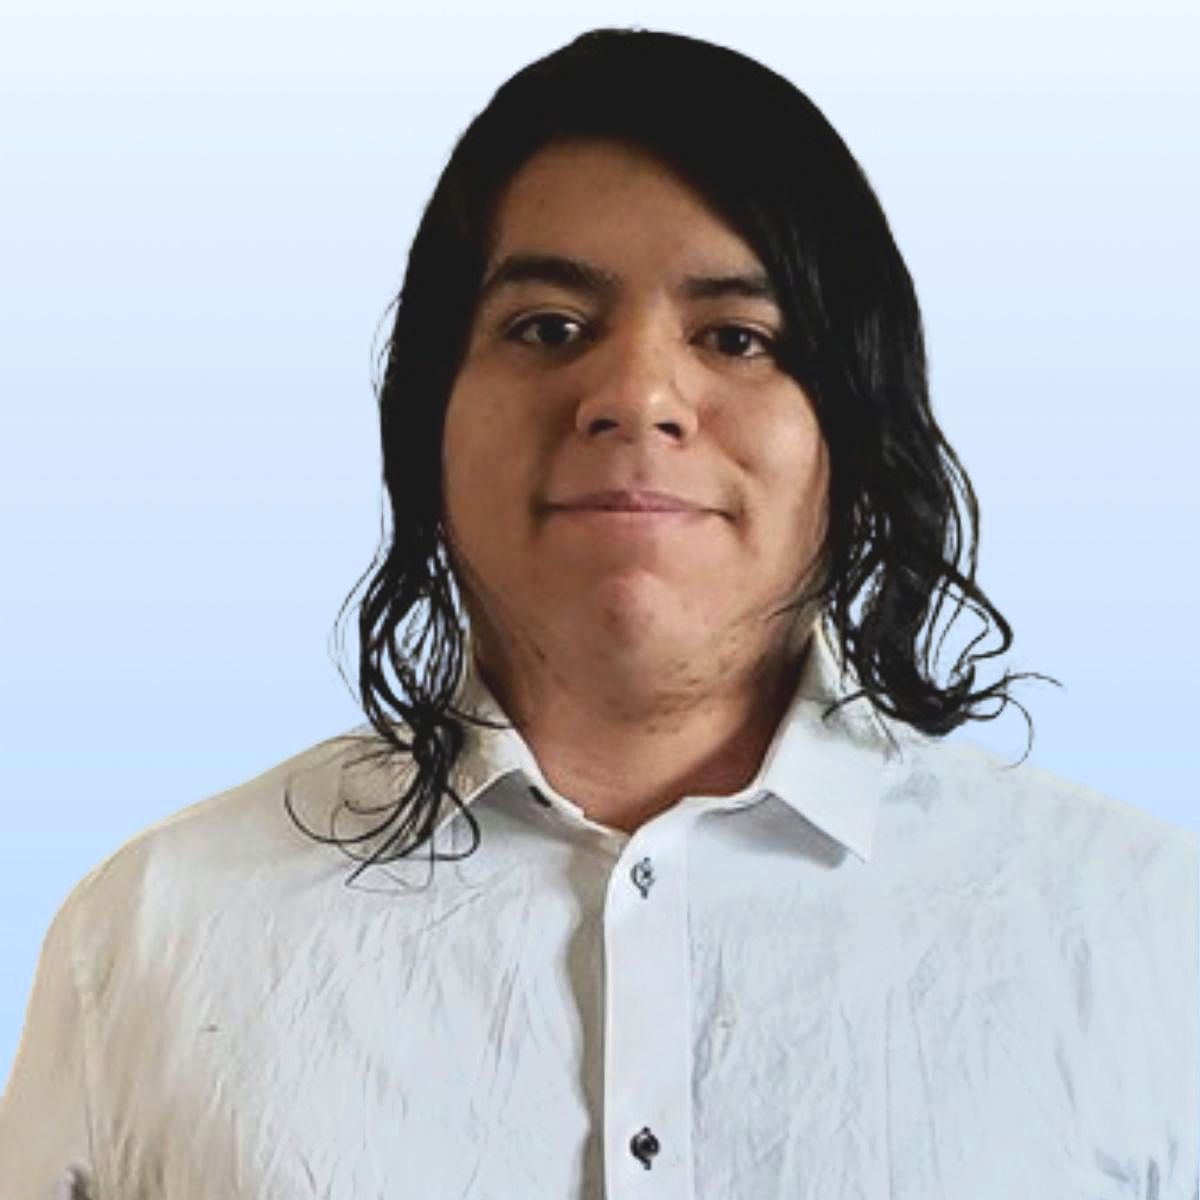 Student Gabriel Restrepo